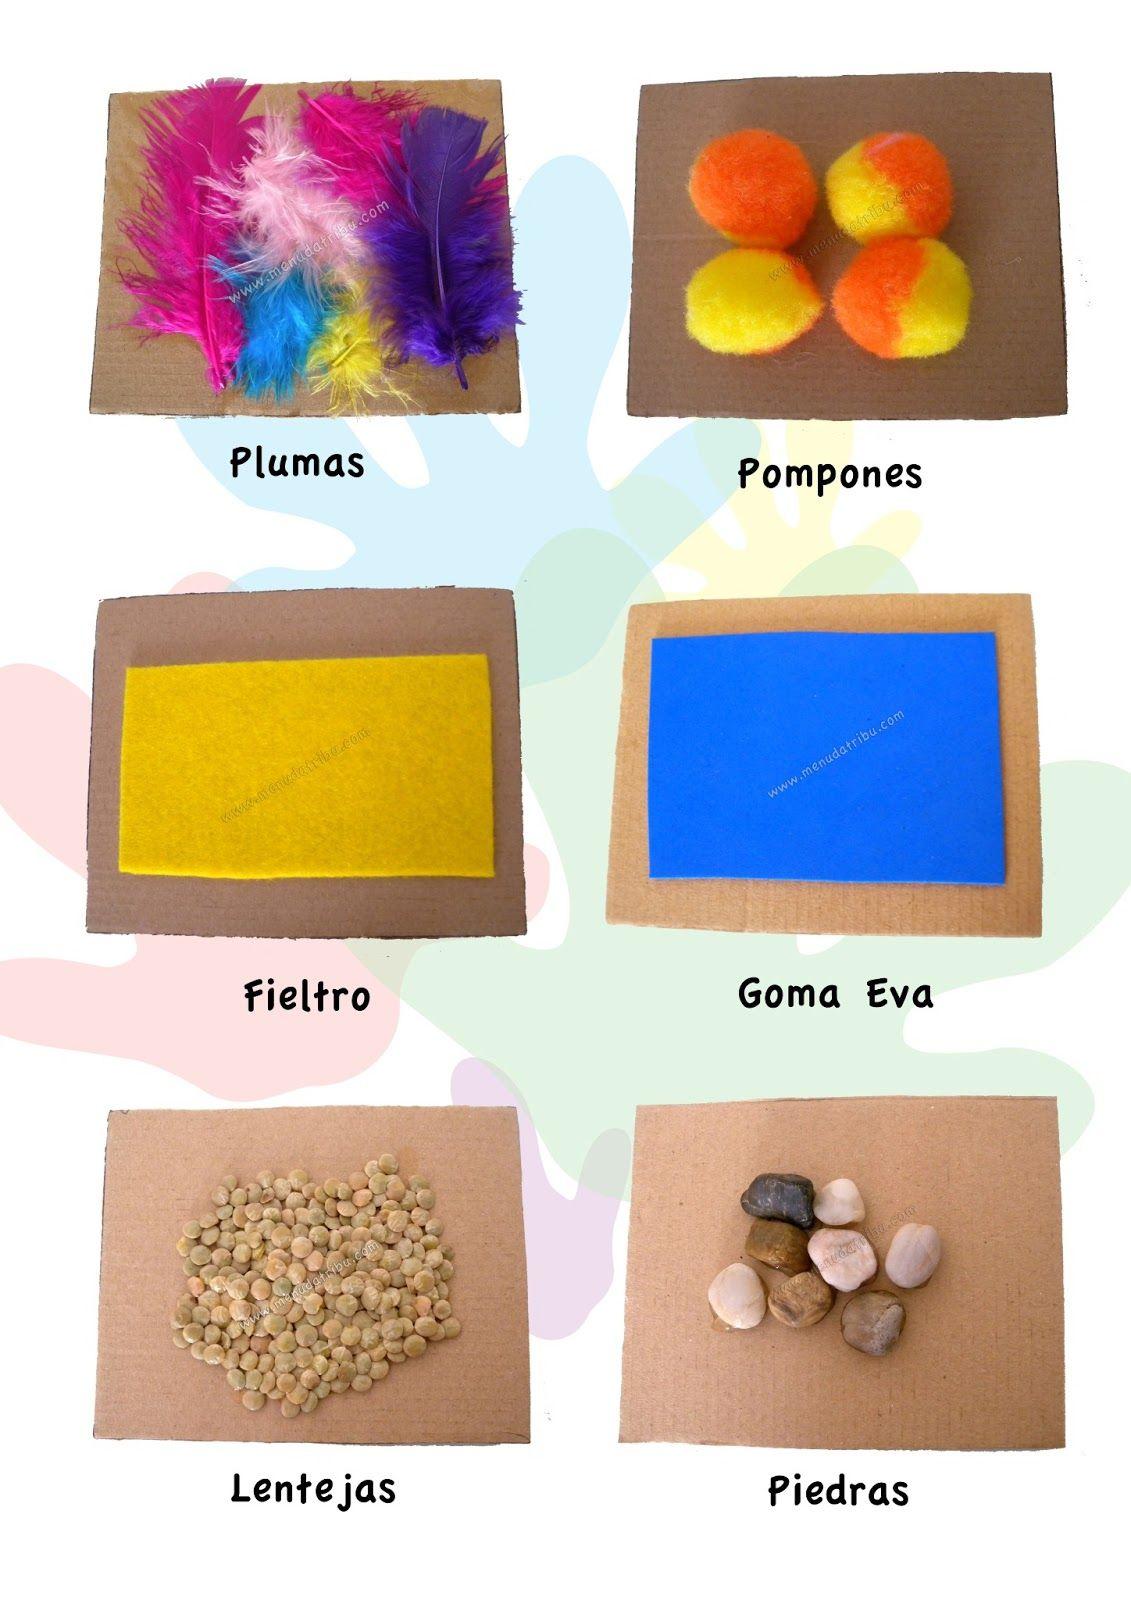 Sentido Del Tacto Para Preescolar Texturas Buscar Con Google Texturas Para Niños Actividades Táctiles Juegos Sensoriales Para Niños